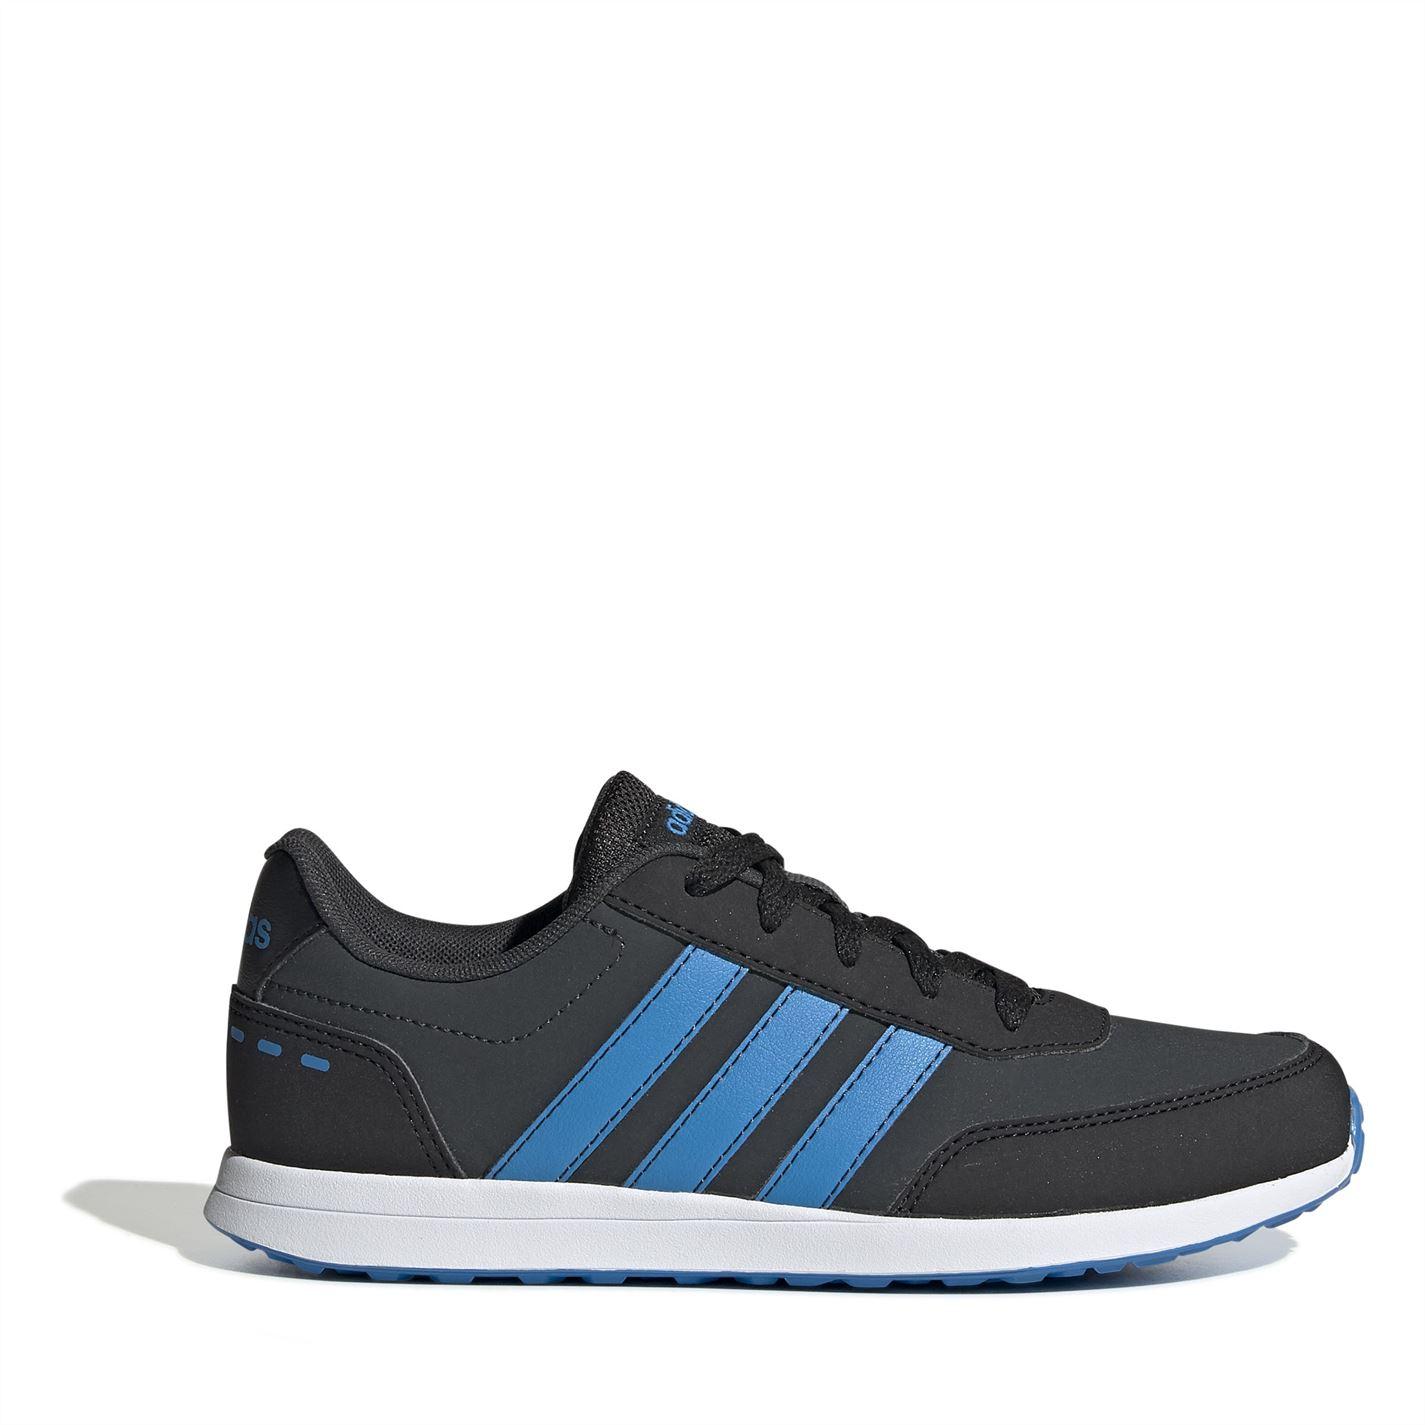 adidas Switch Nubuck Child Boys Trainers Carbon/Blk/Blue